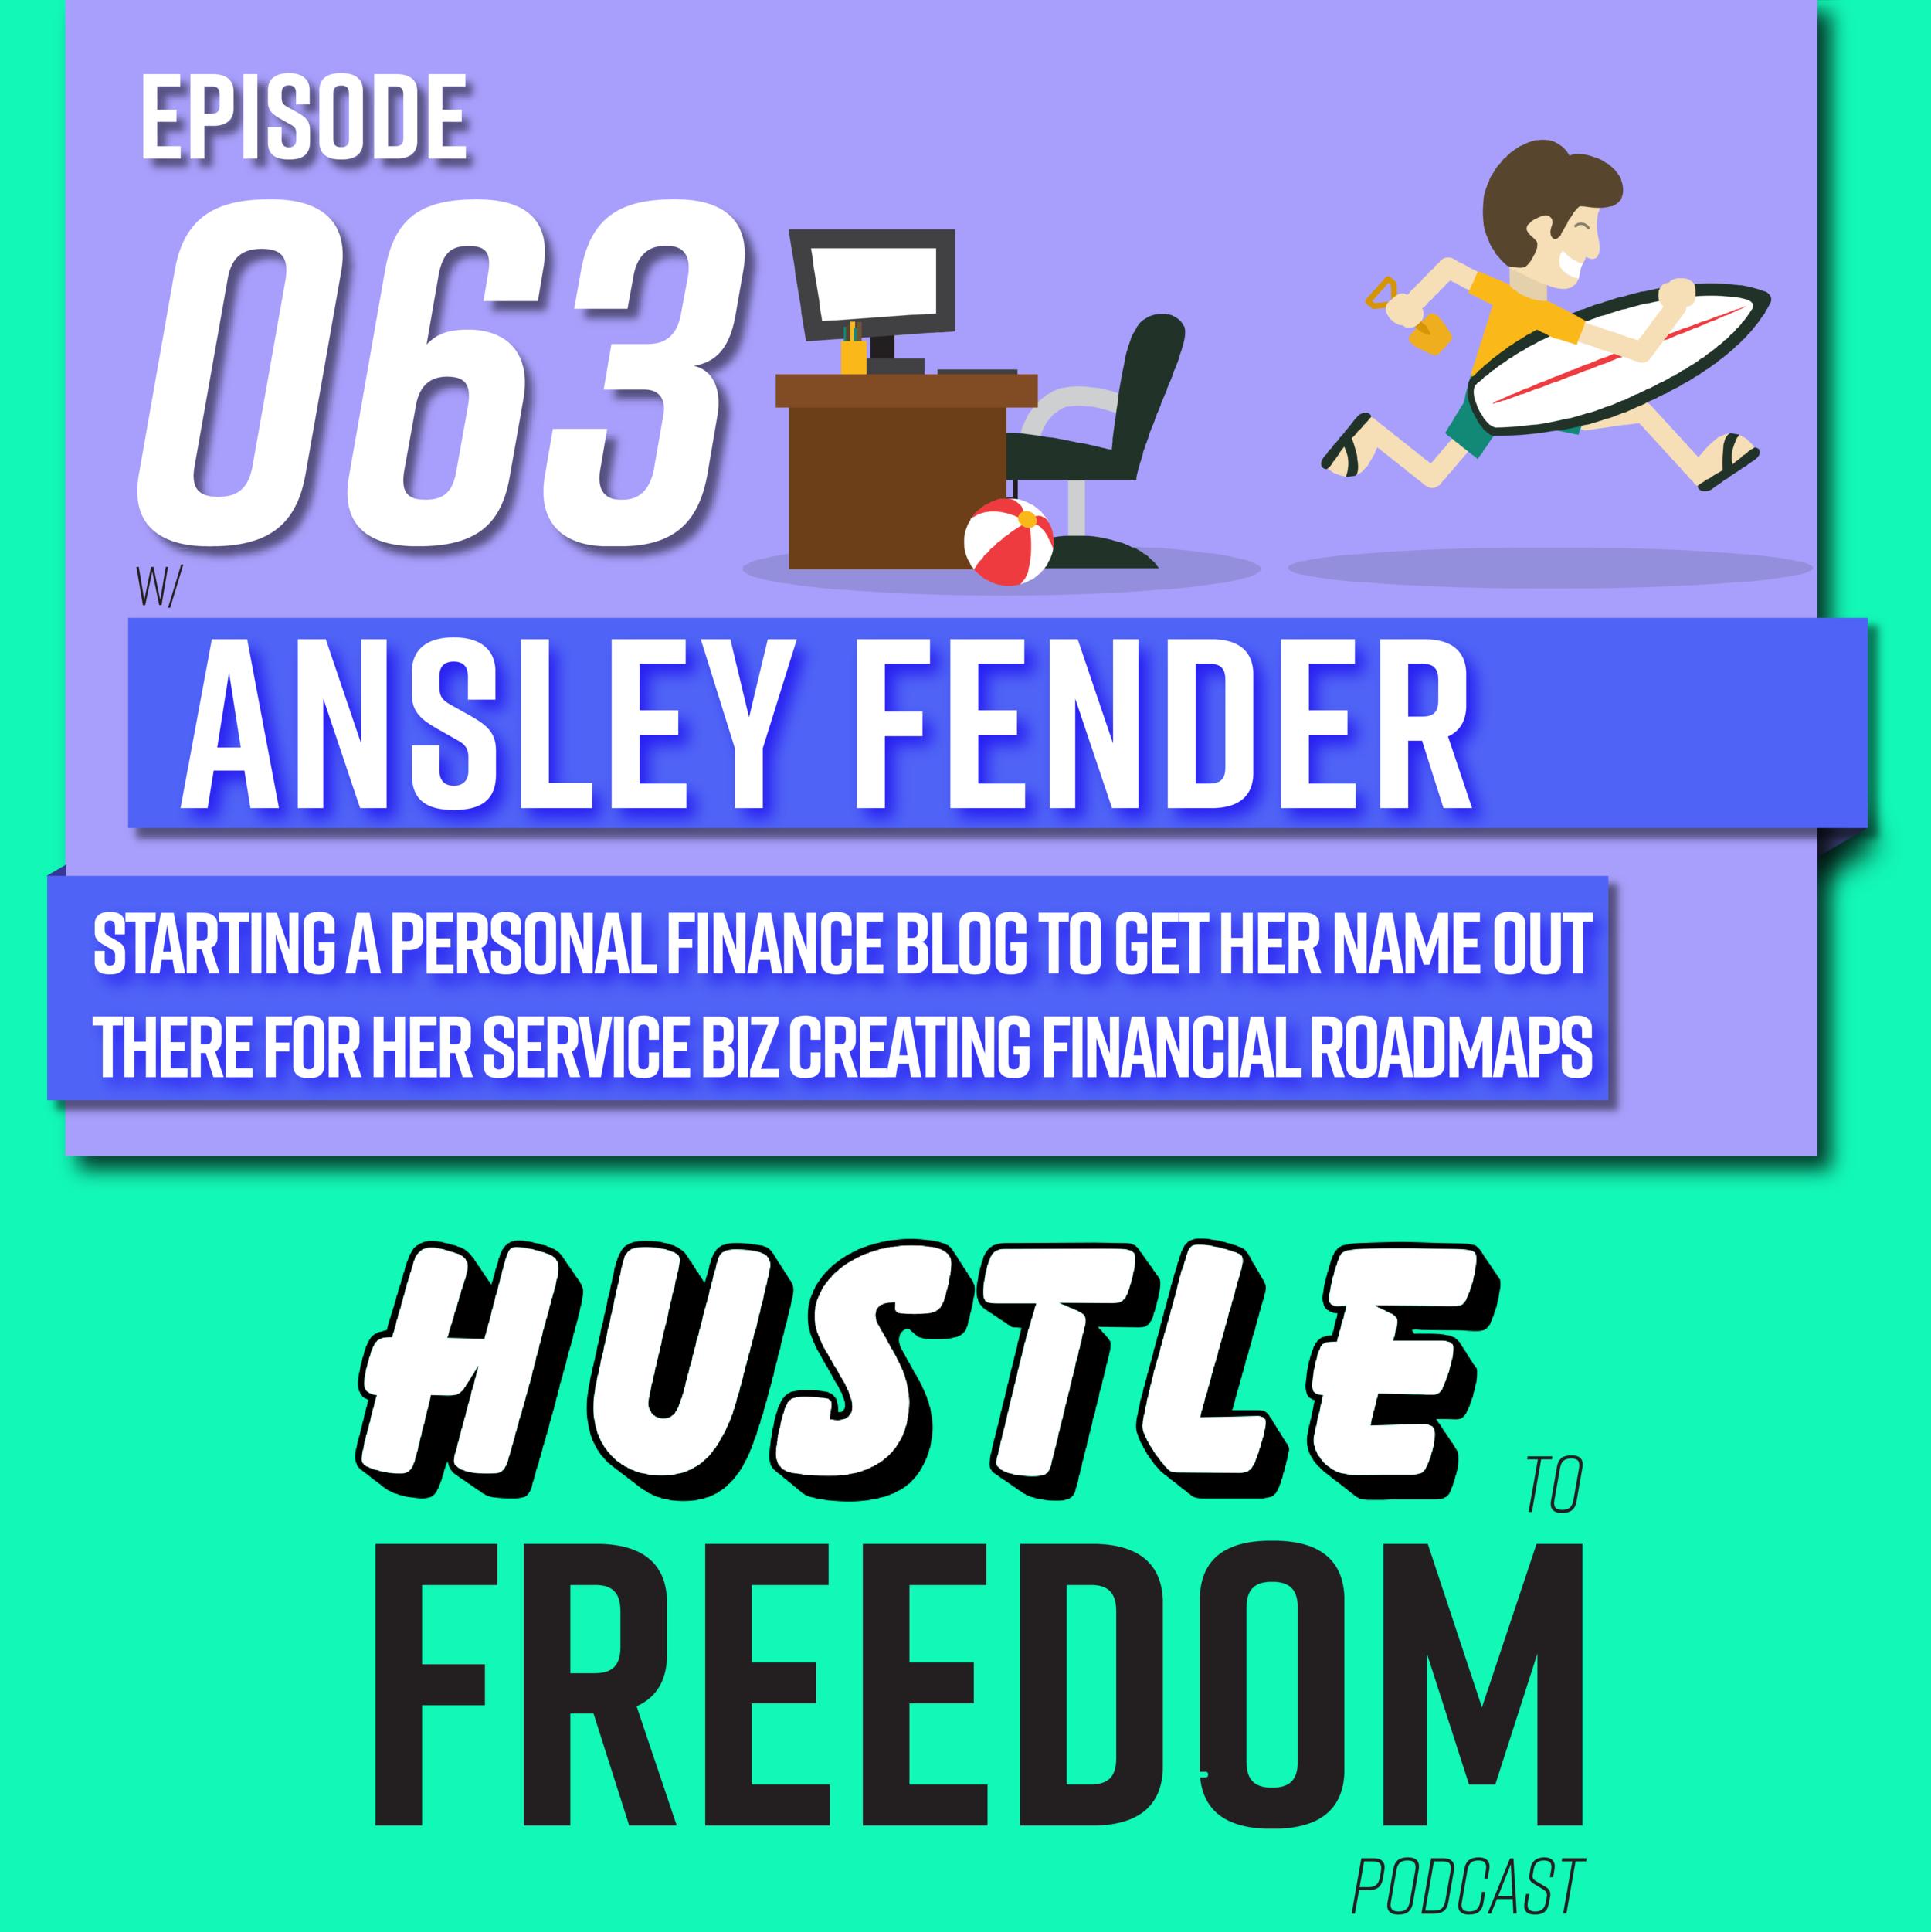 Hustle to Freedom